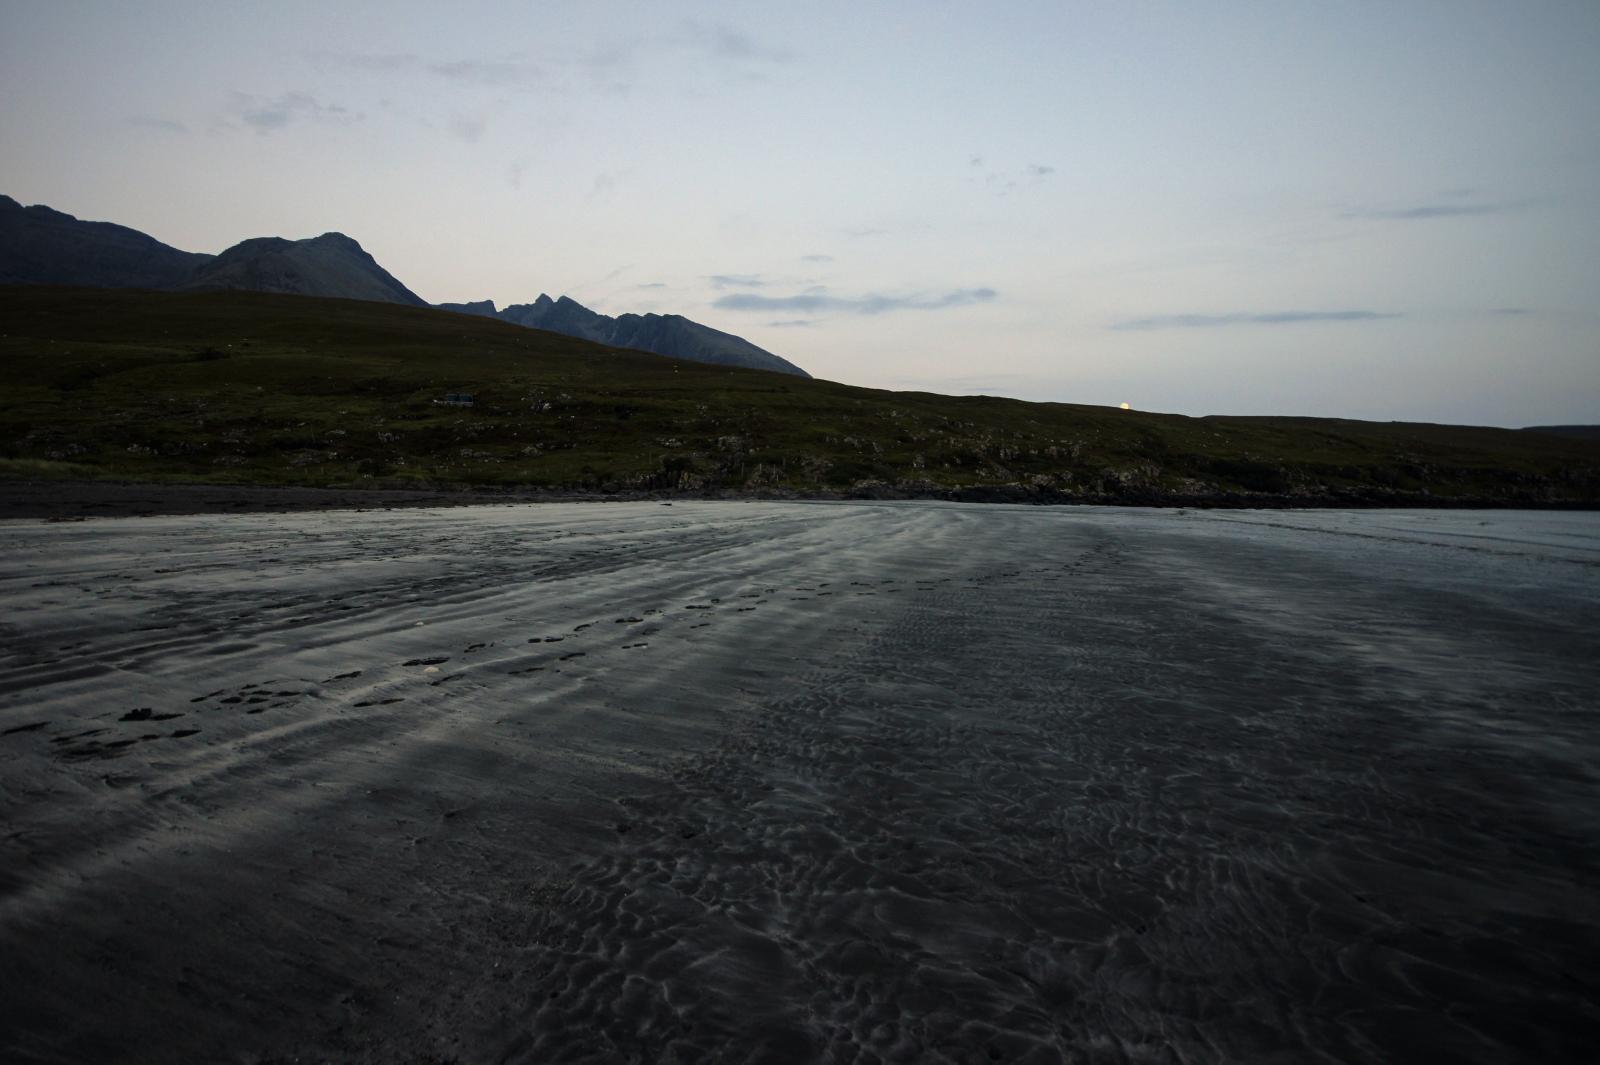 Kieran Rae Skye Glenbrittle Campsite Beach Black Cuillin Scotland